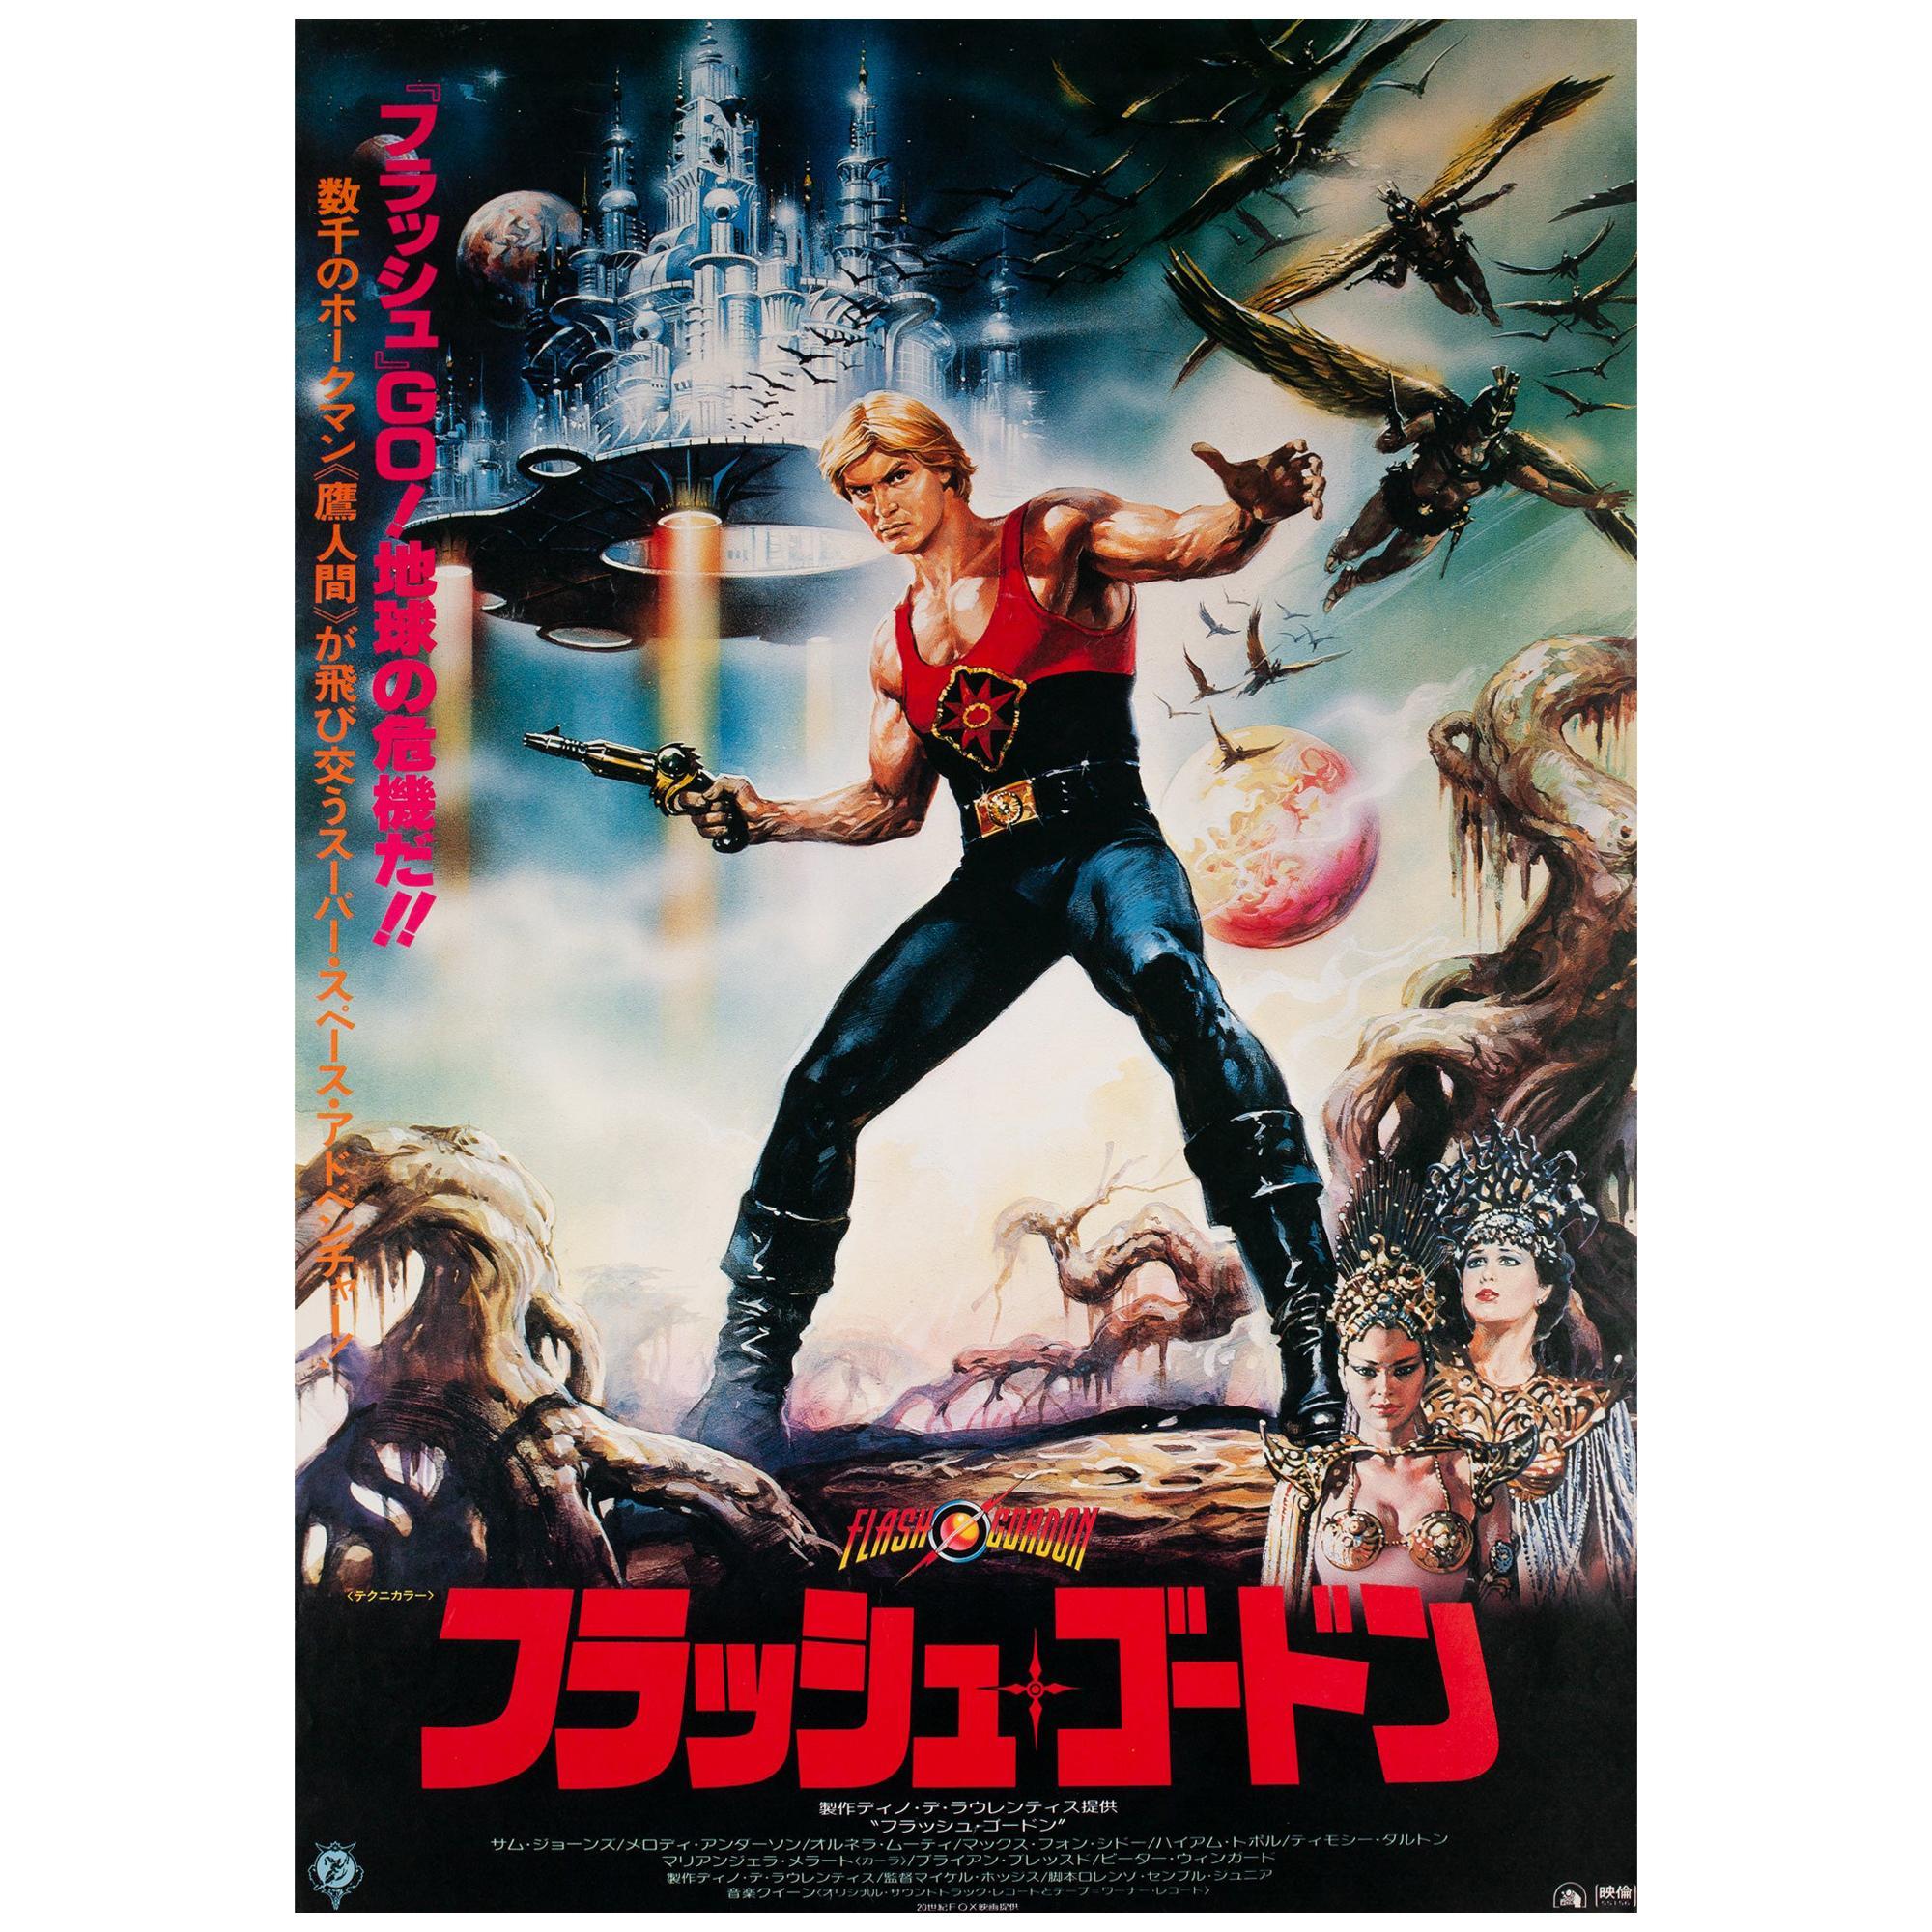 Flash Gordon, Japanese Film Movie Poster, 1980, Casaro